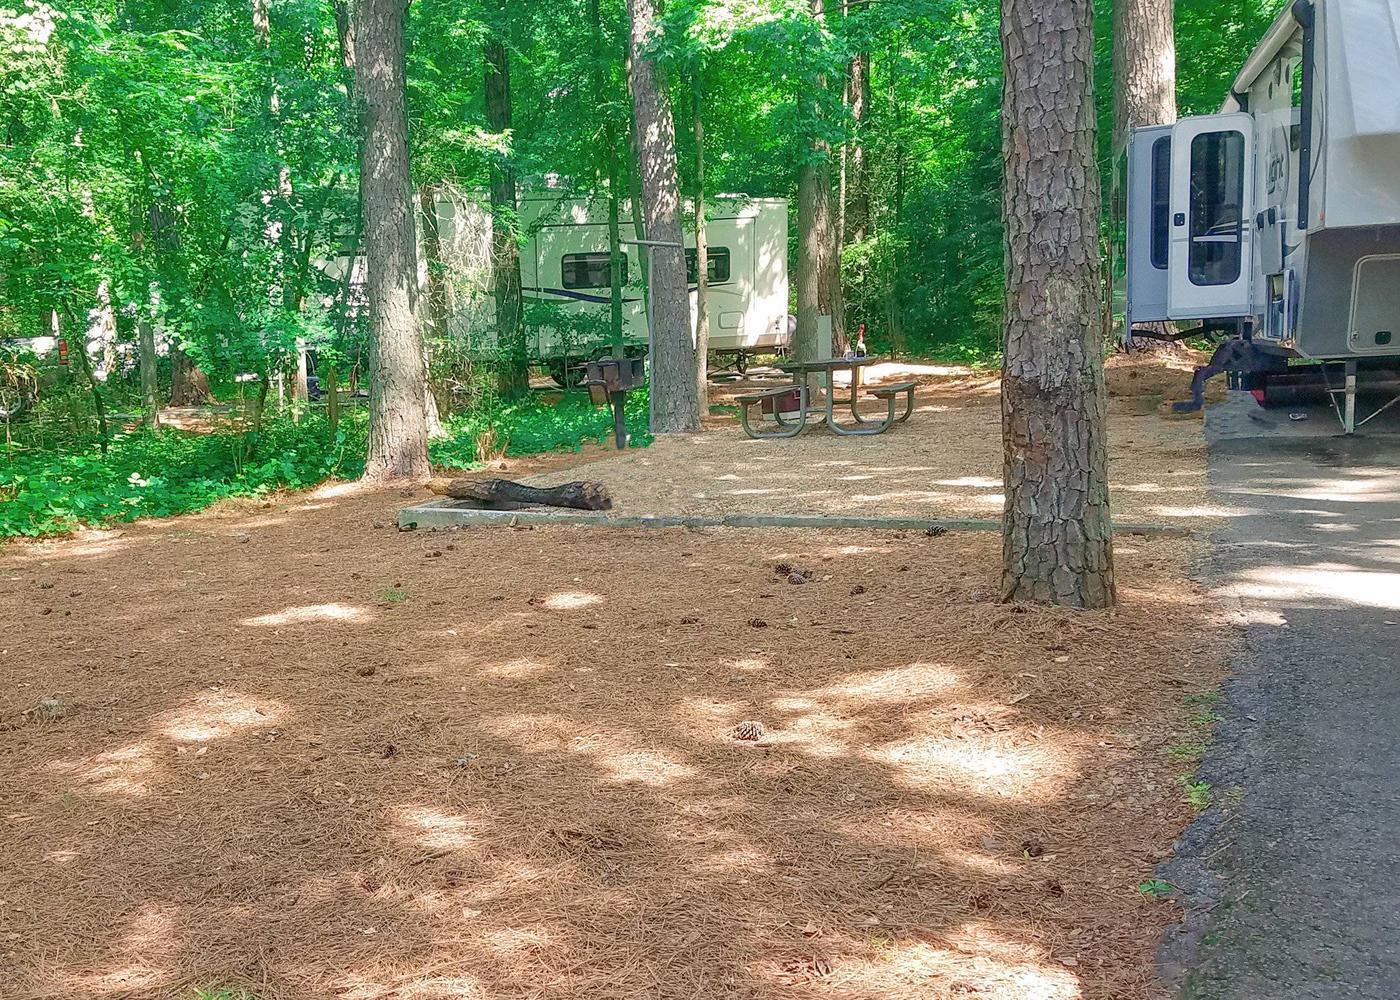 Campsite view.Victoria Campground, campsite 32.